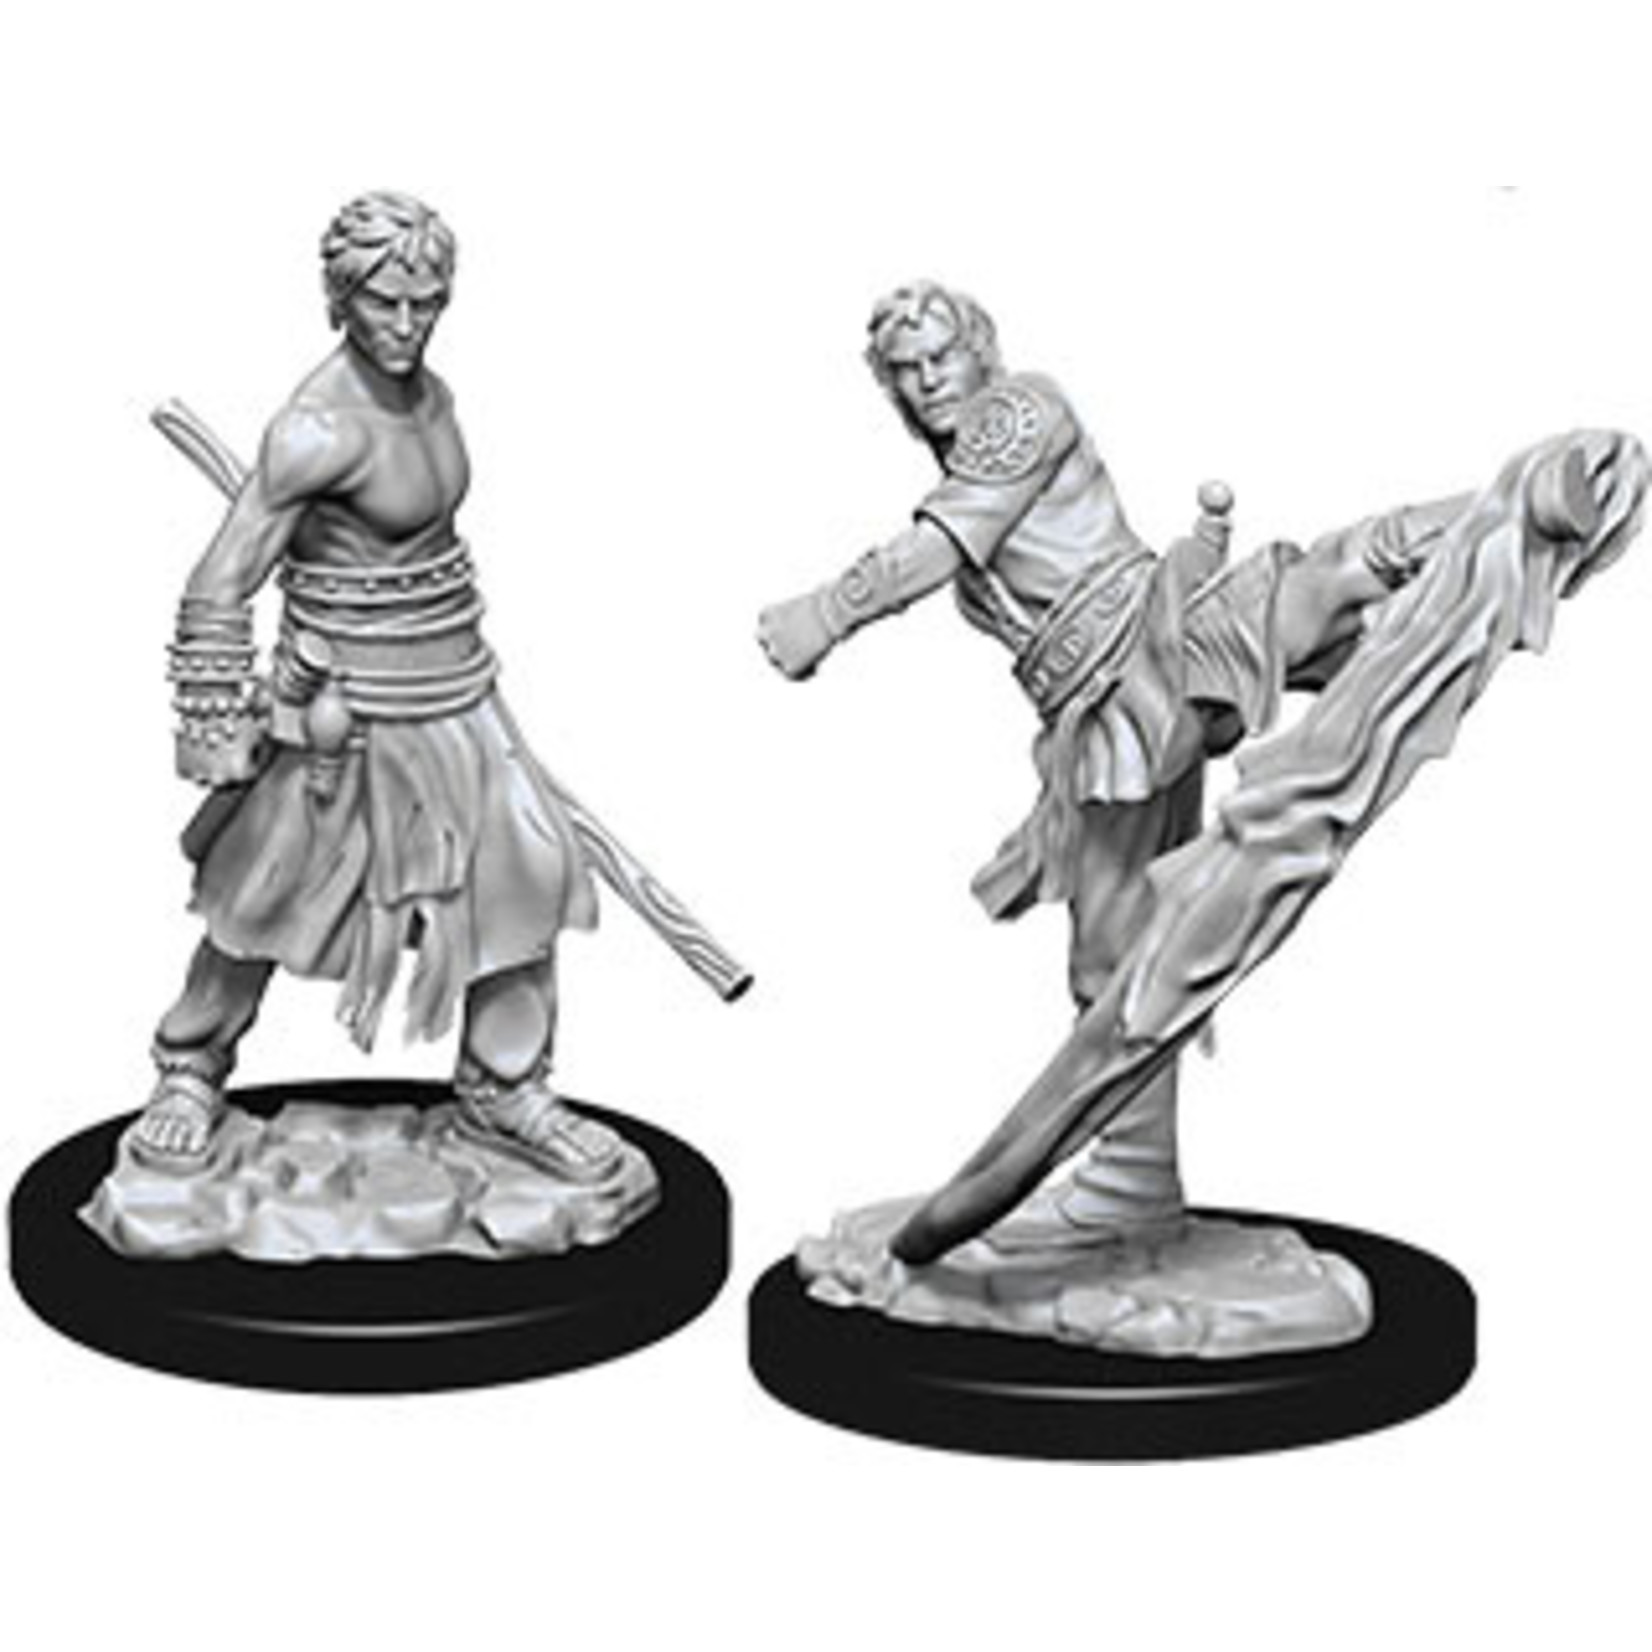 Dungeons & Dragons Nolzur`s Marvelous Unpainted Miniatures: W10 Male Half-Elf Monk